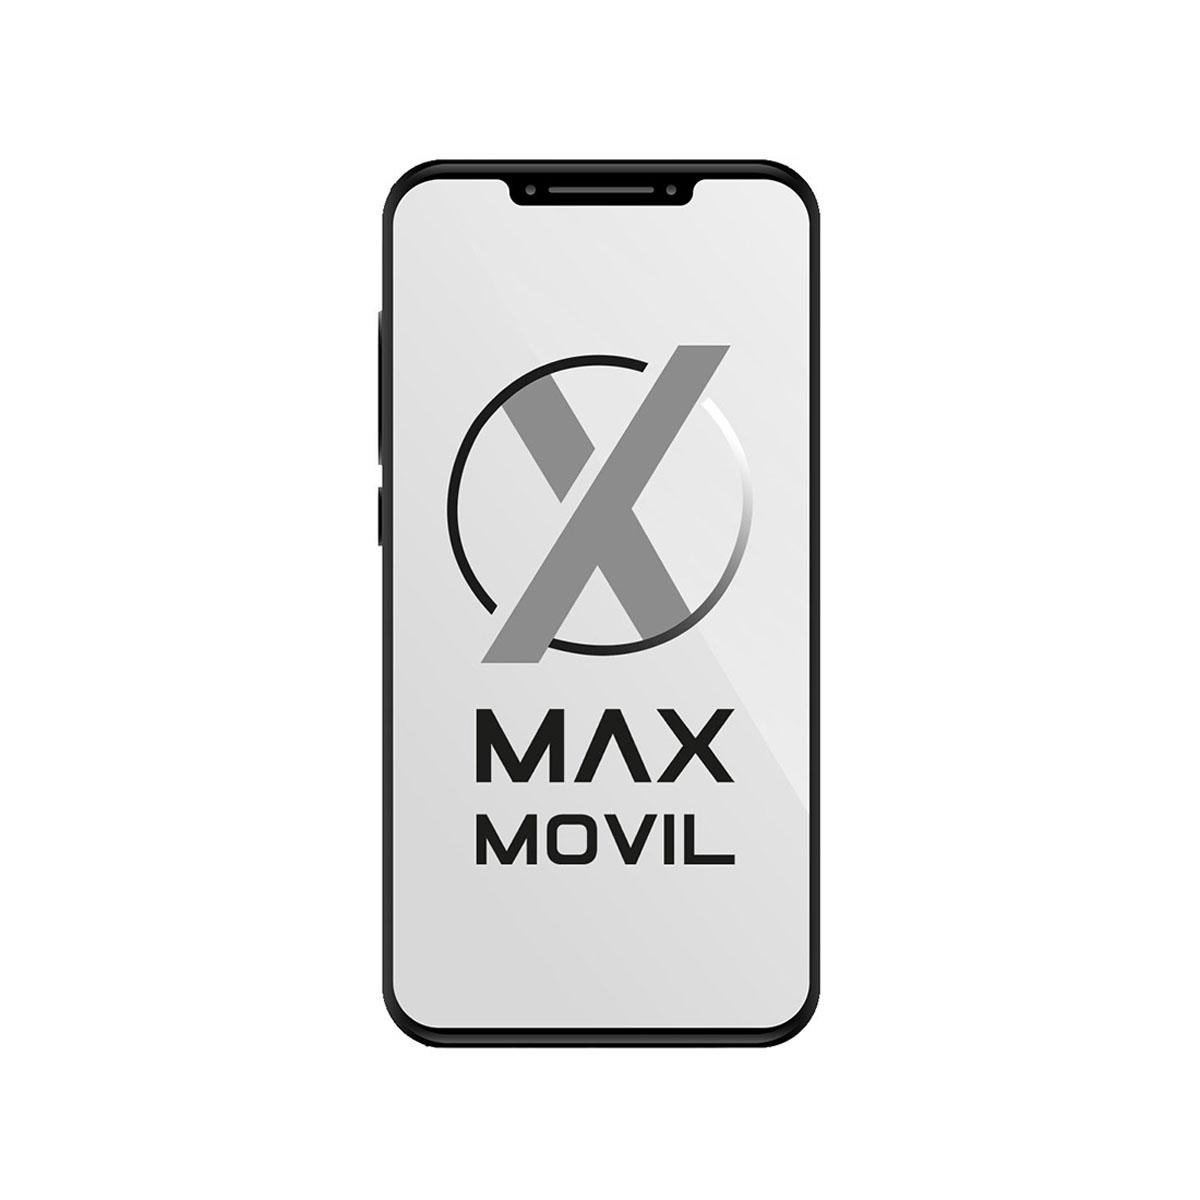 Apple iPhone SE (2020) 256GB (PRODUCT) Rojo MXVV2QL/A